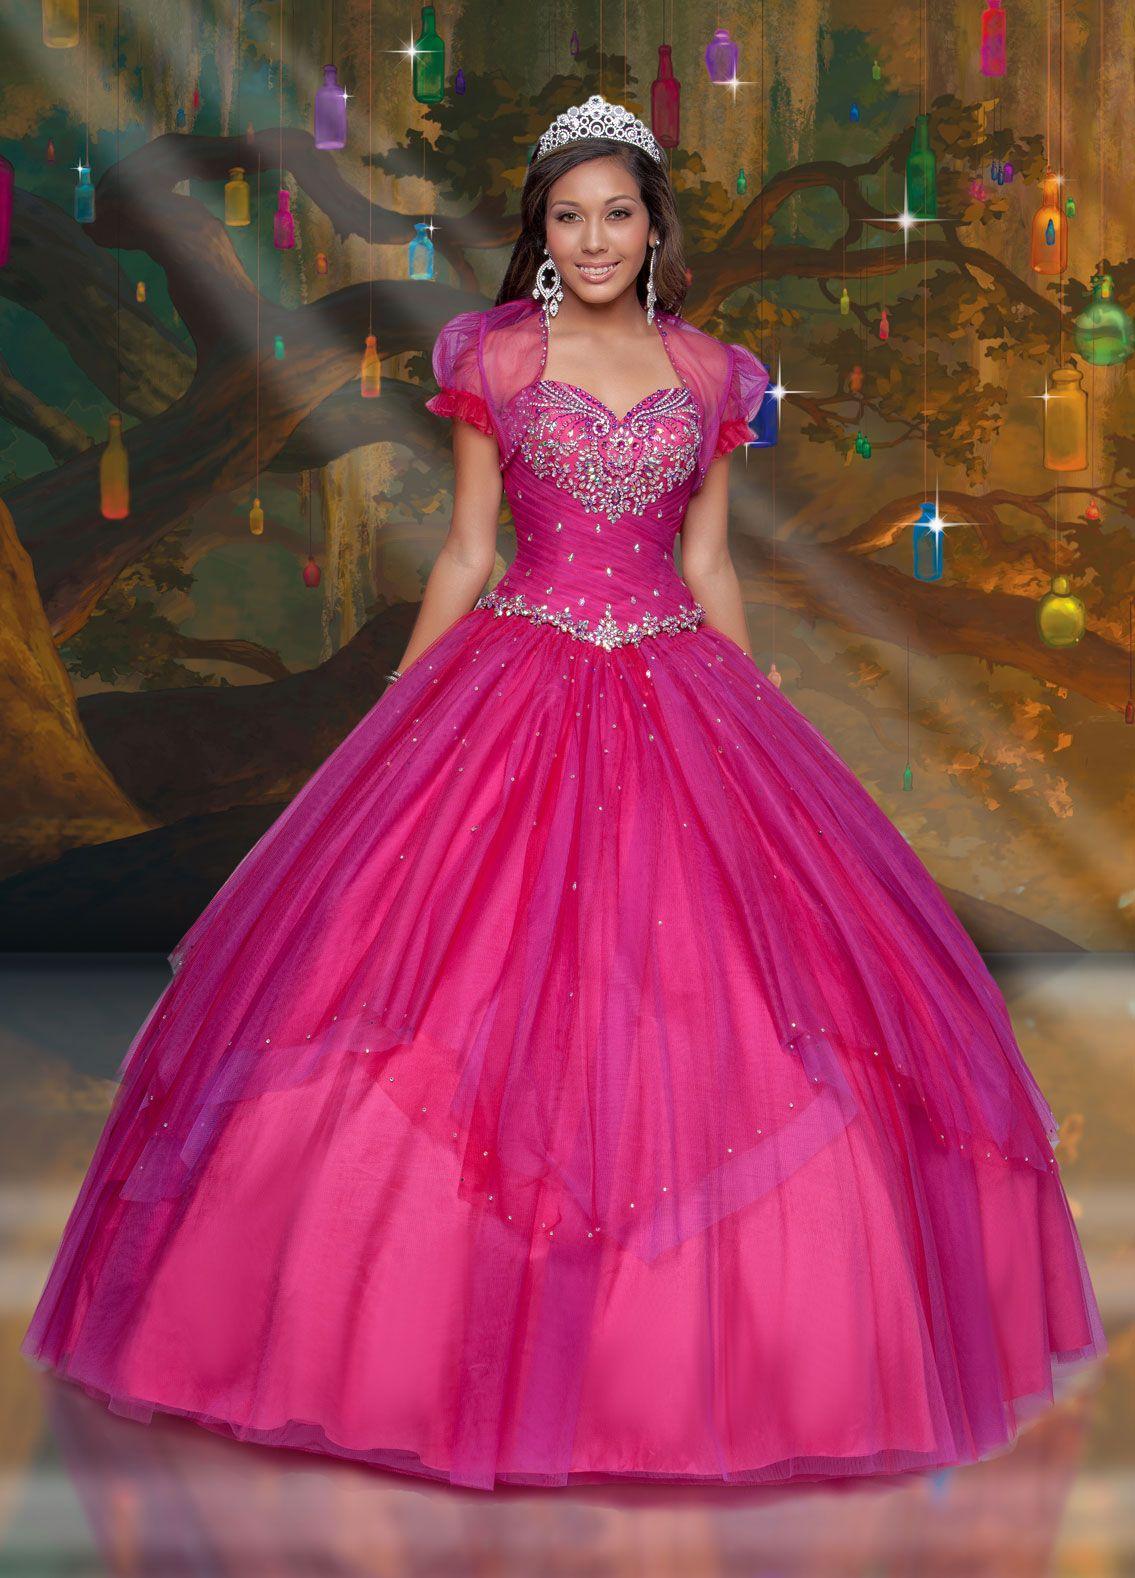 Tiana   Disney Royal Ball   Color rosa y morado   Pinterest ...